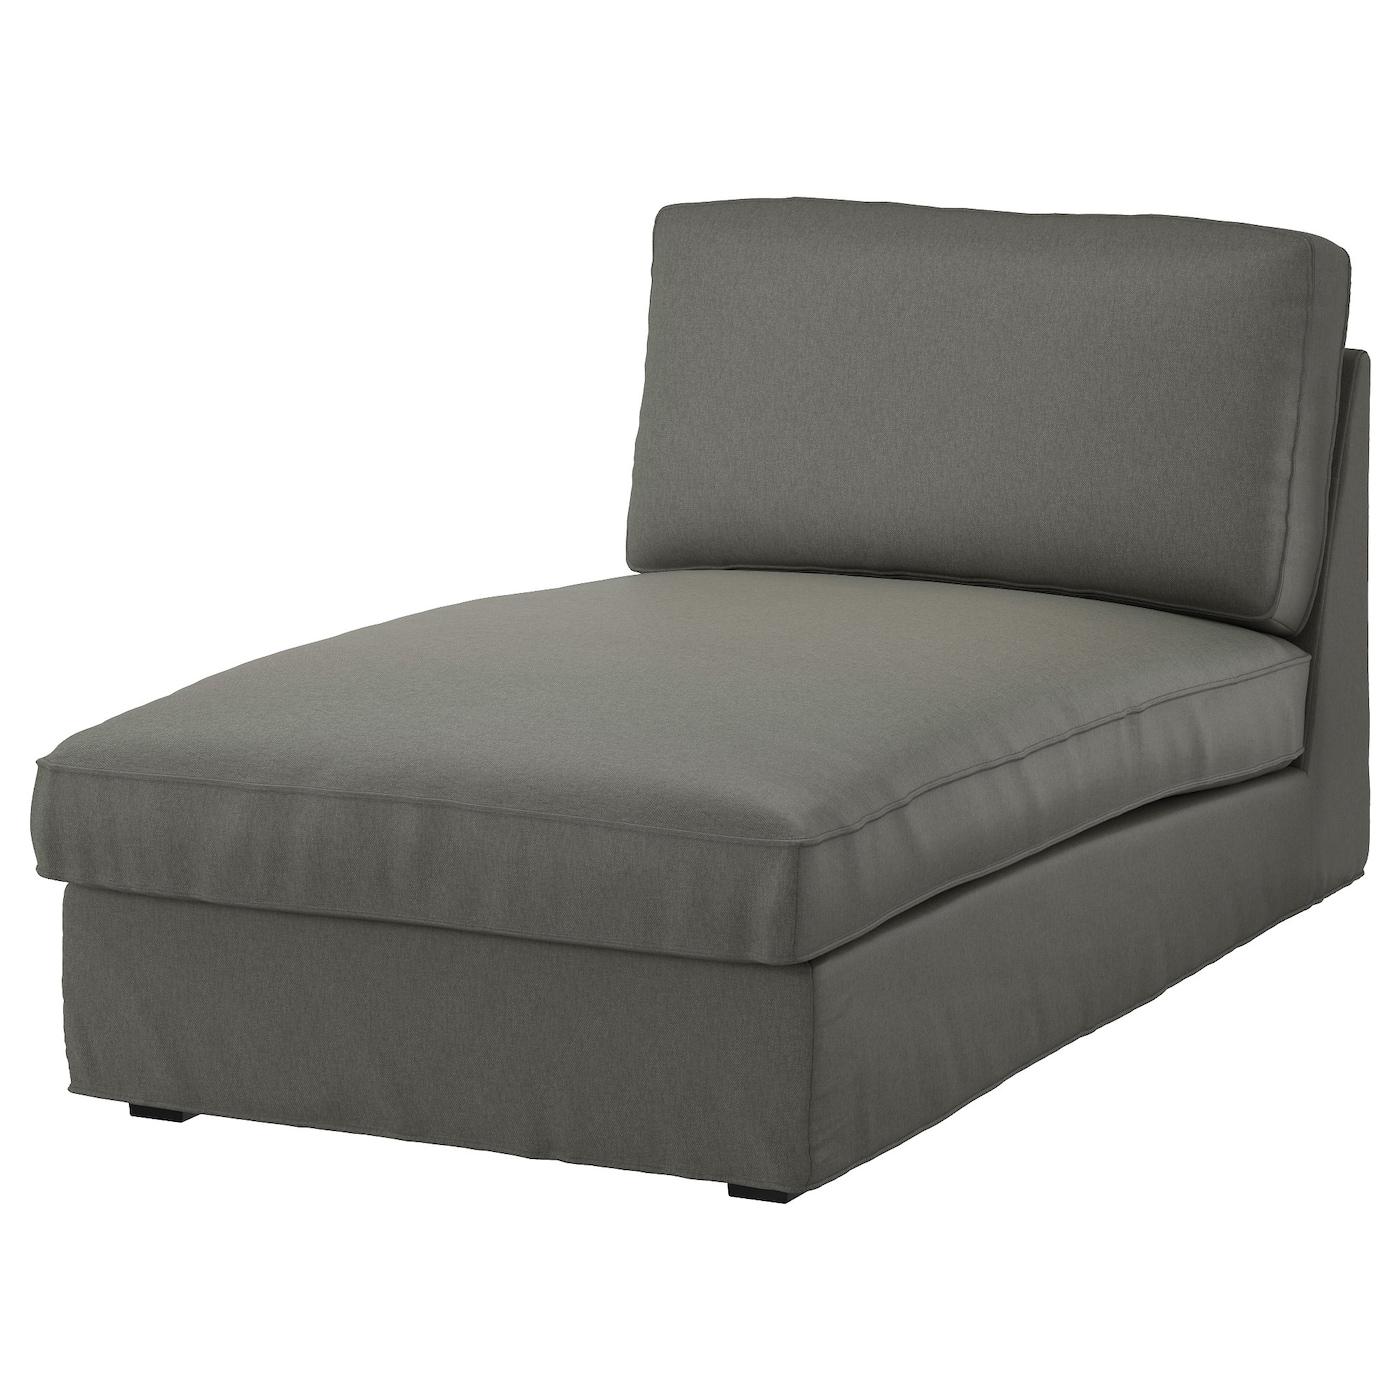 Kivik cover for chaise longue borred grey green ikea - Chaise longue exterieur ikea ...